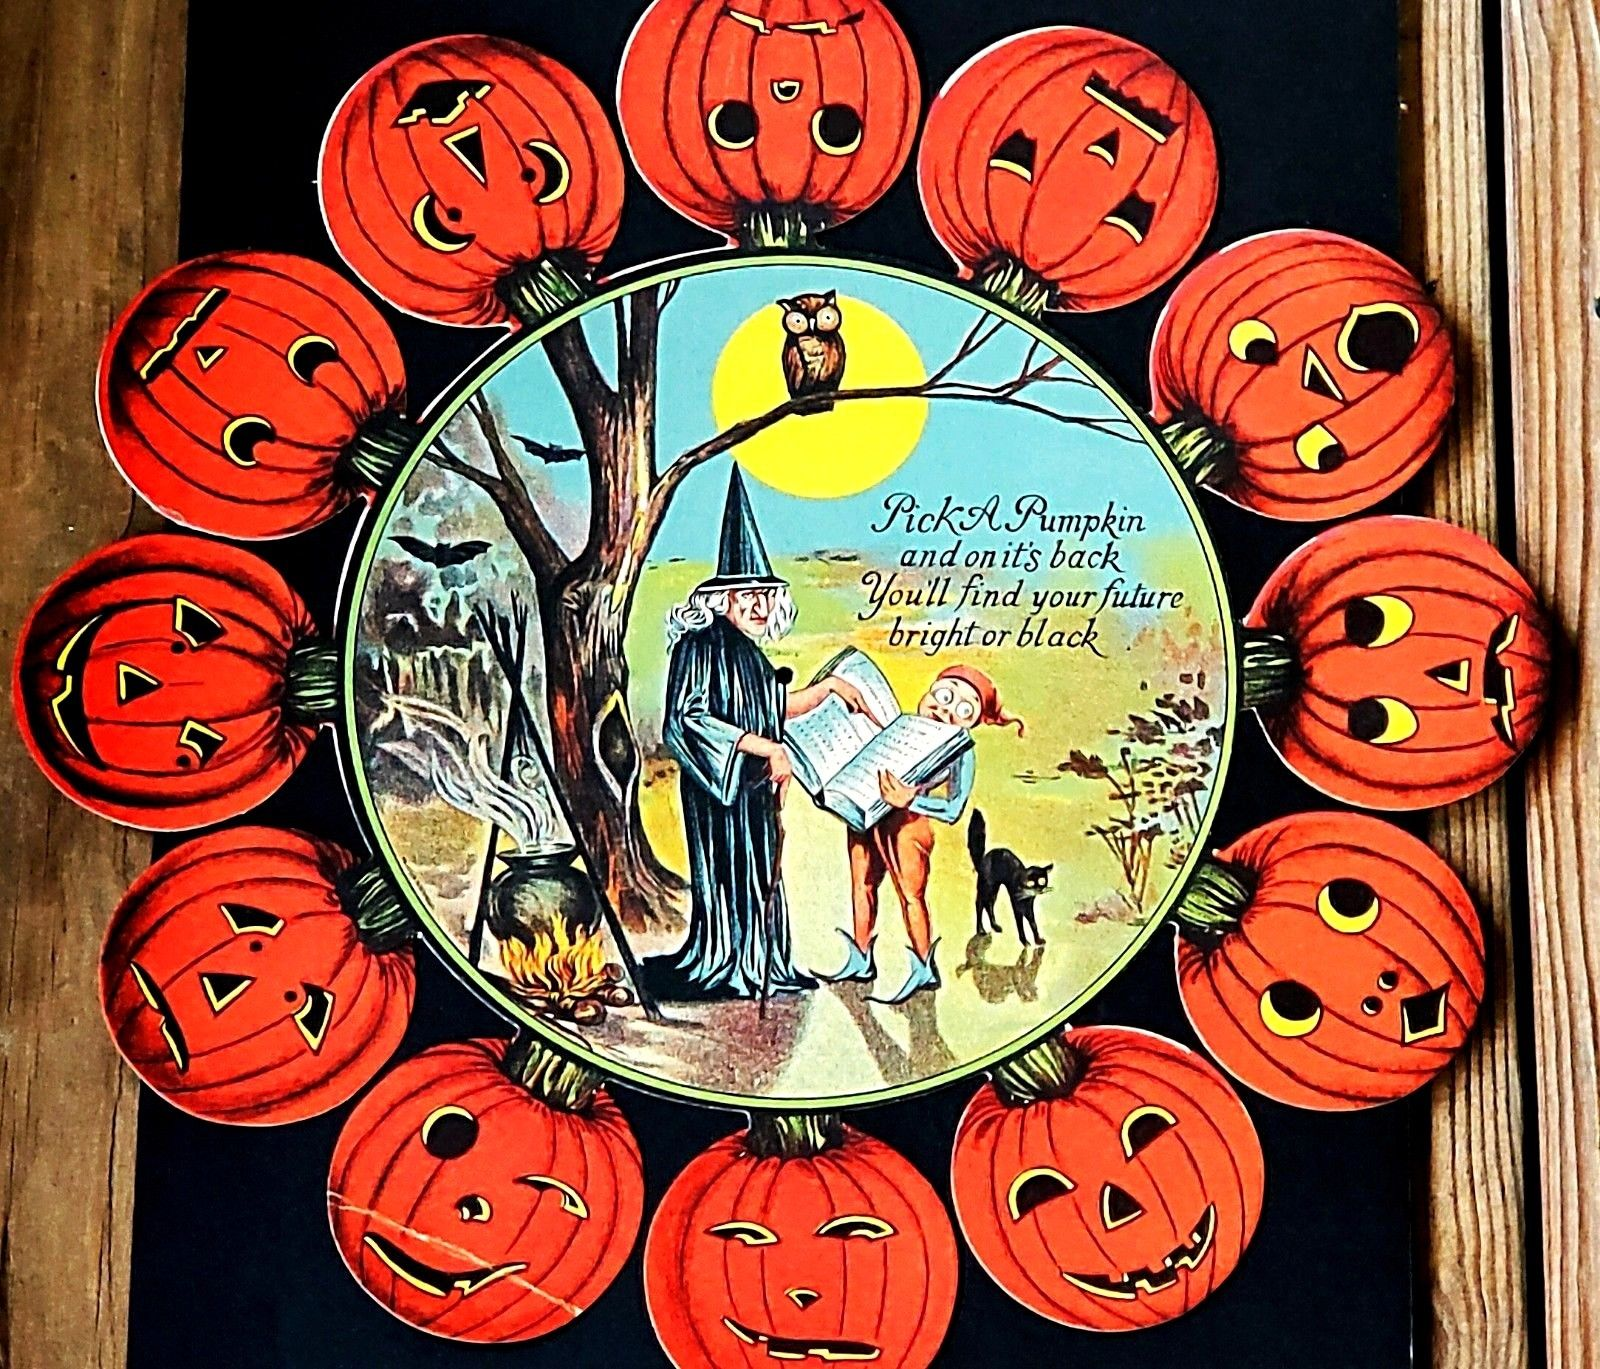 vintage halloween game at ebay